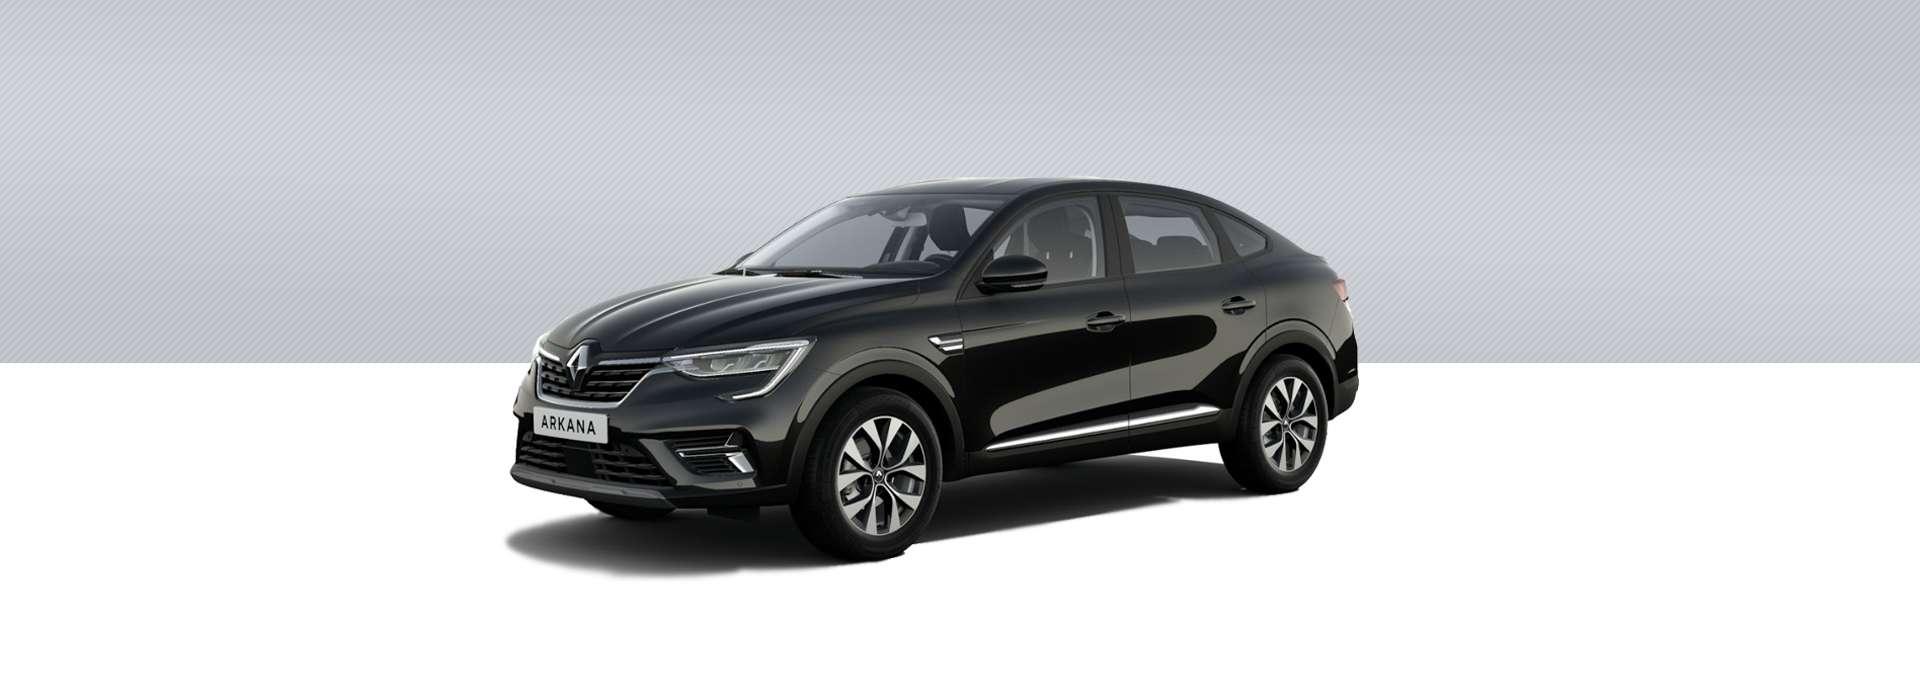 Renault NUEVO ARKANA